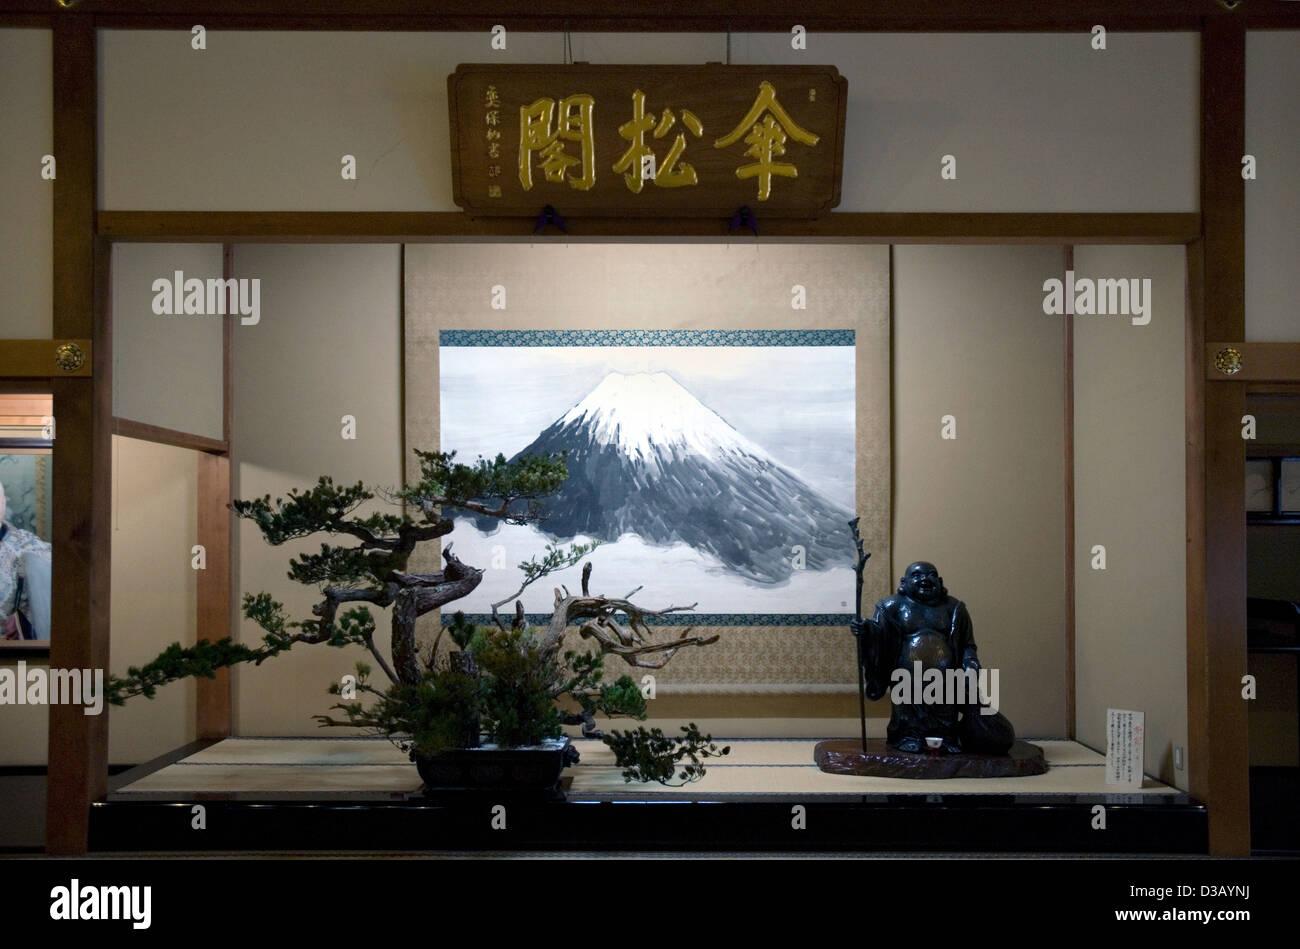 Tokonoma Style Display Of Mount Fuji Scroll Bonsai Tree And Buddha Stock Photo Alamy